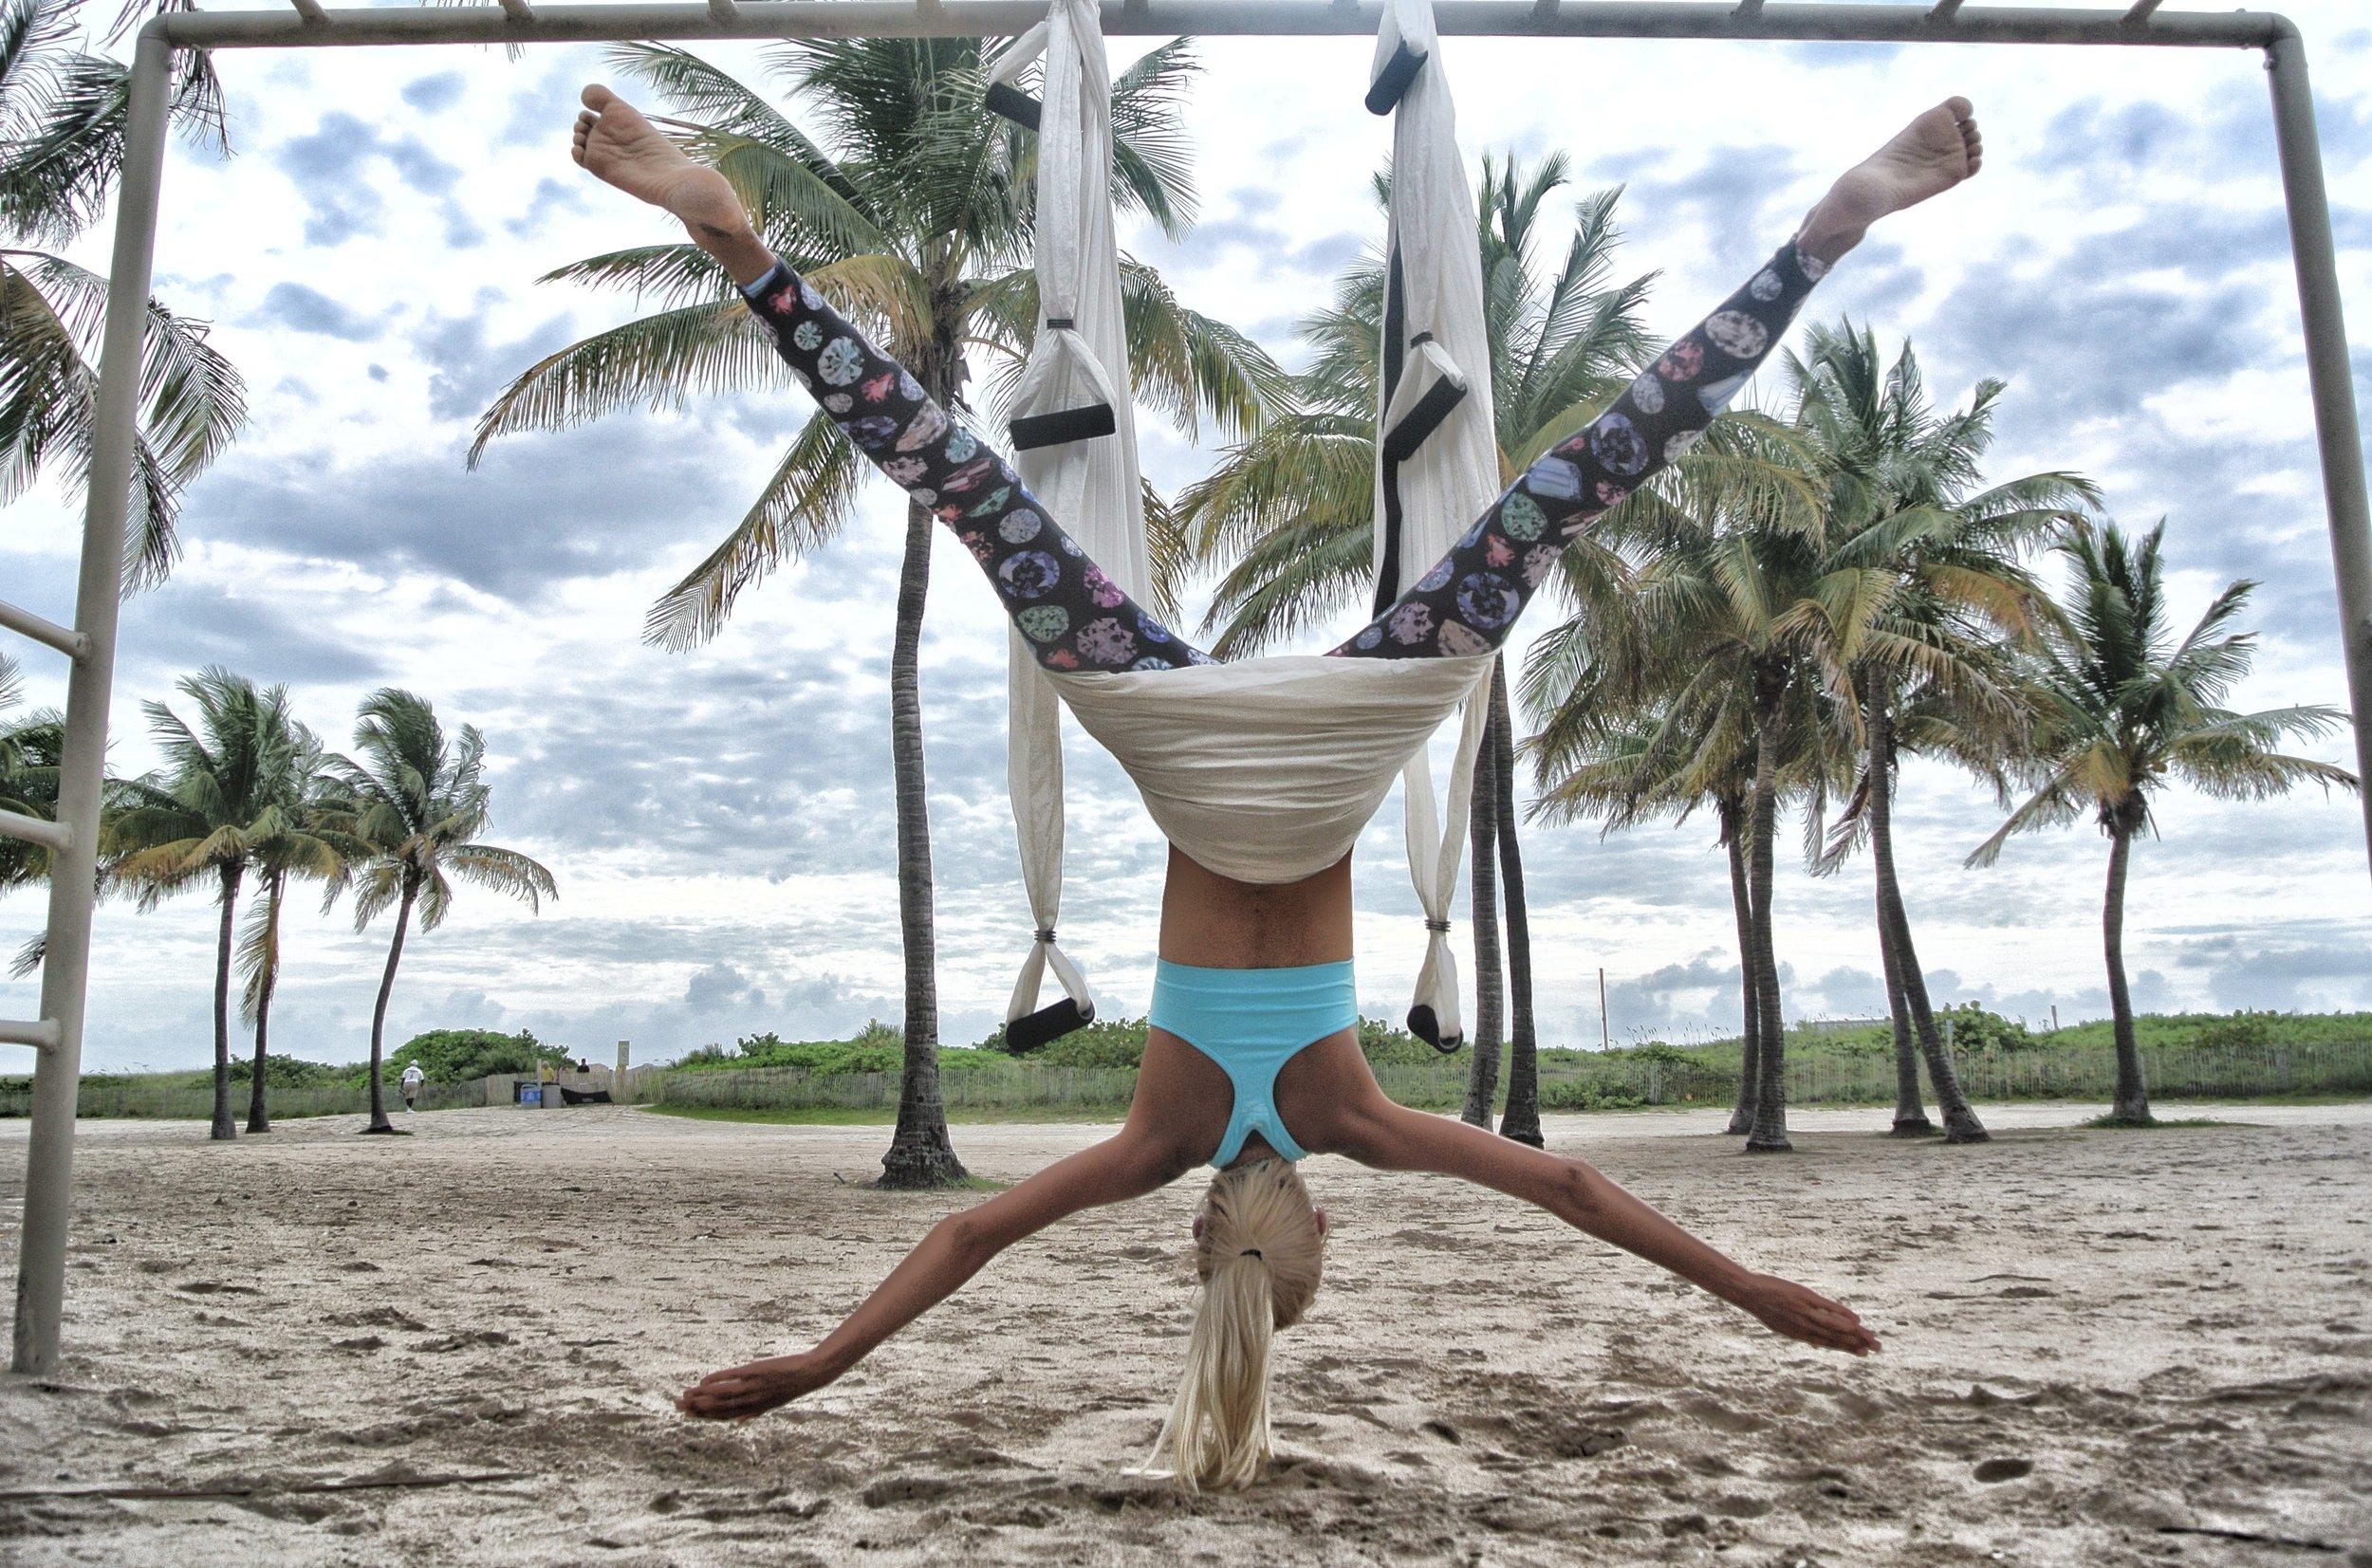 aerial-yoga-anti-gravity-yoga-beach-705122.jpg